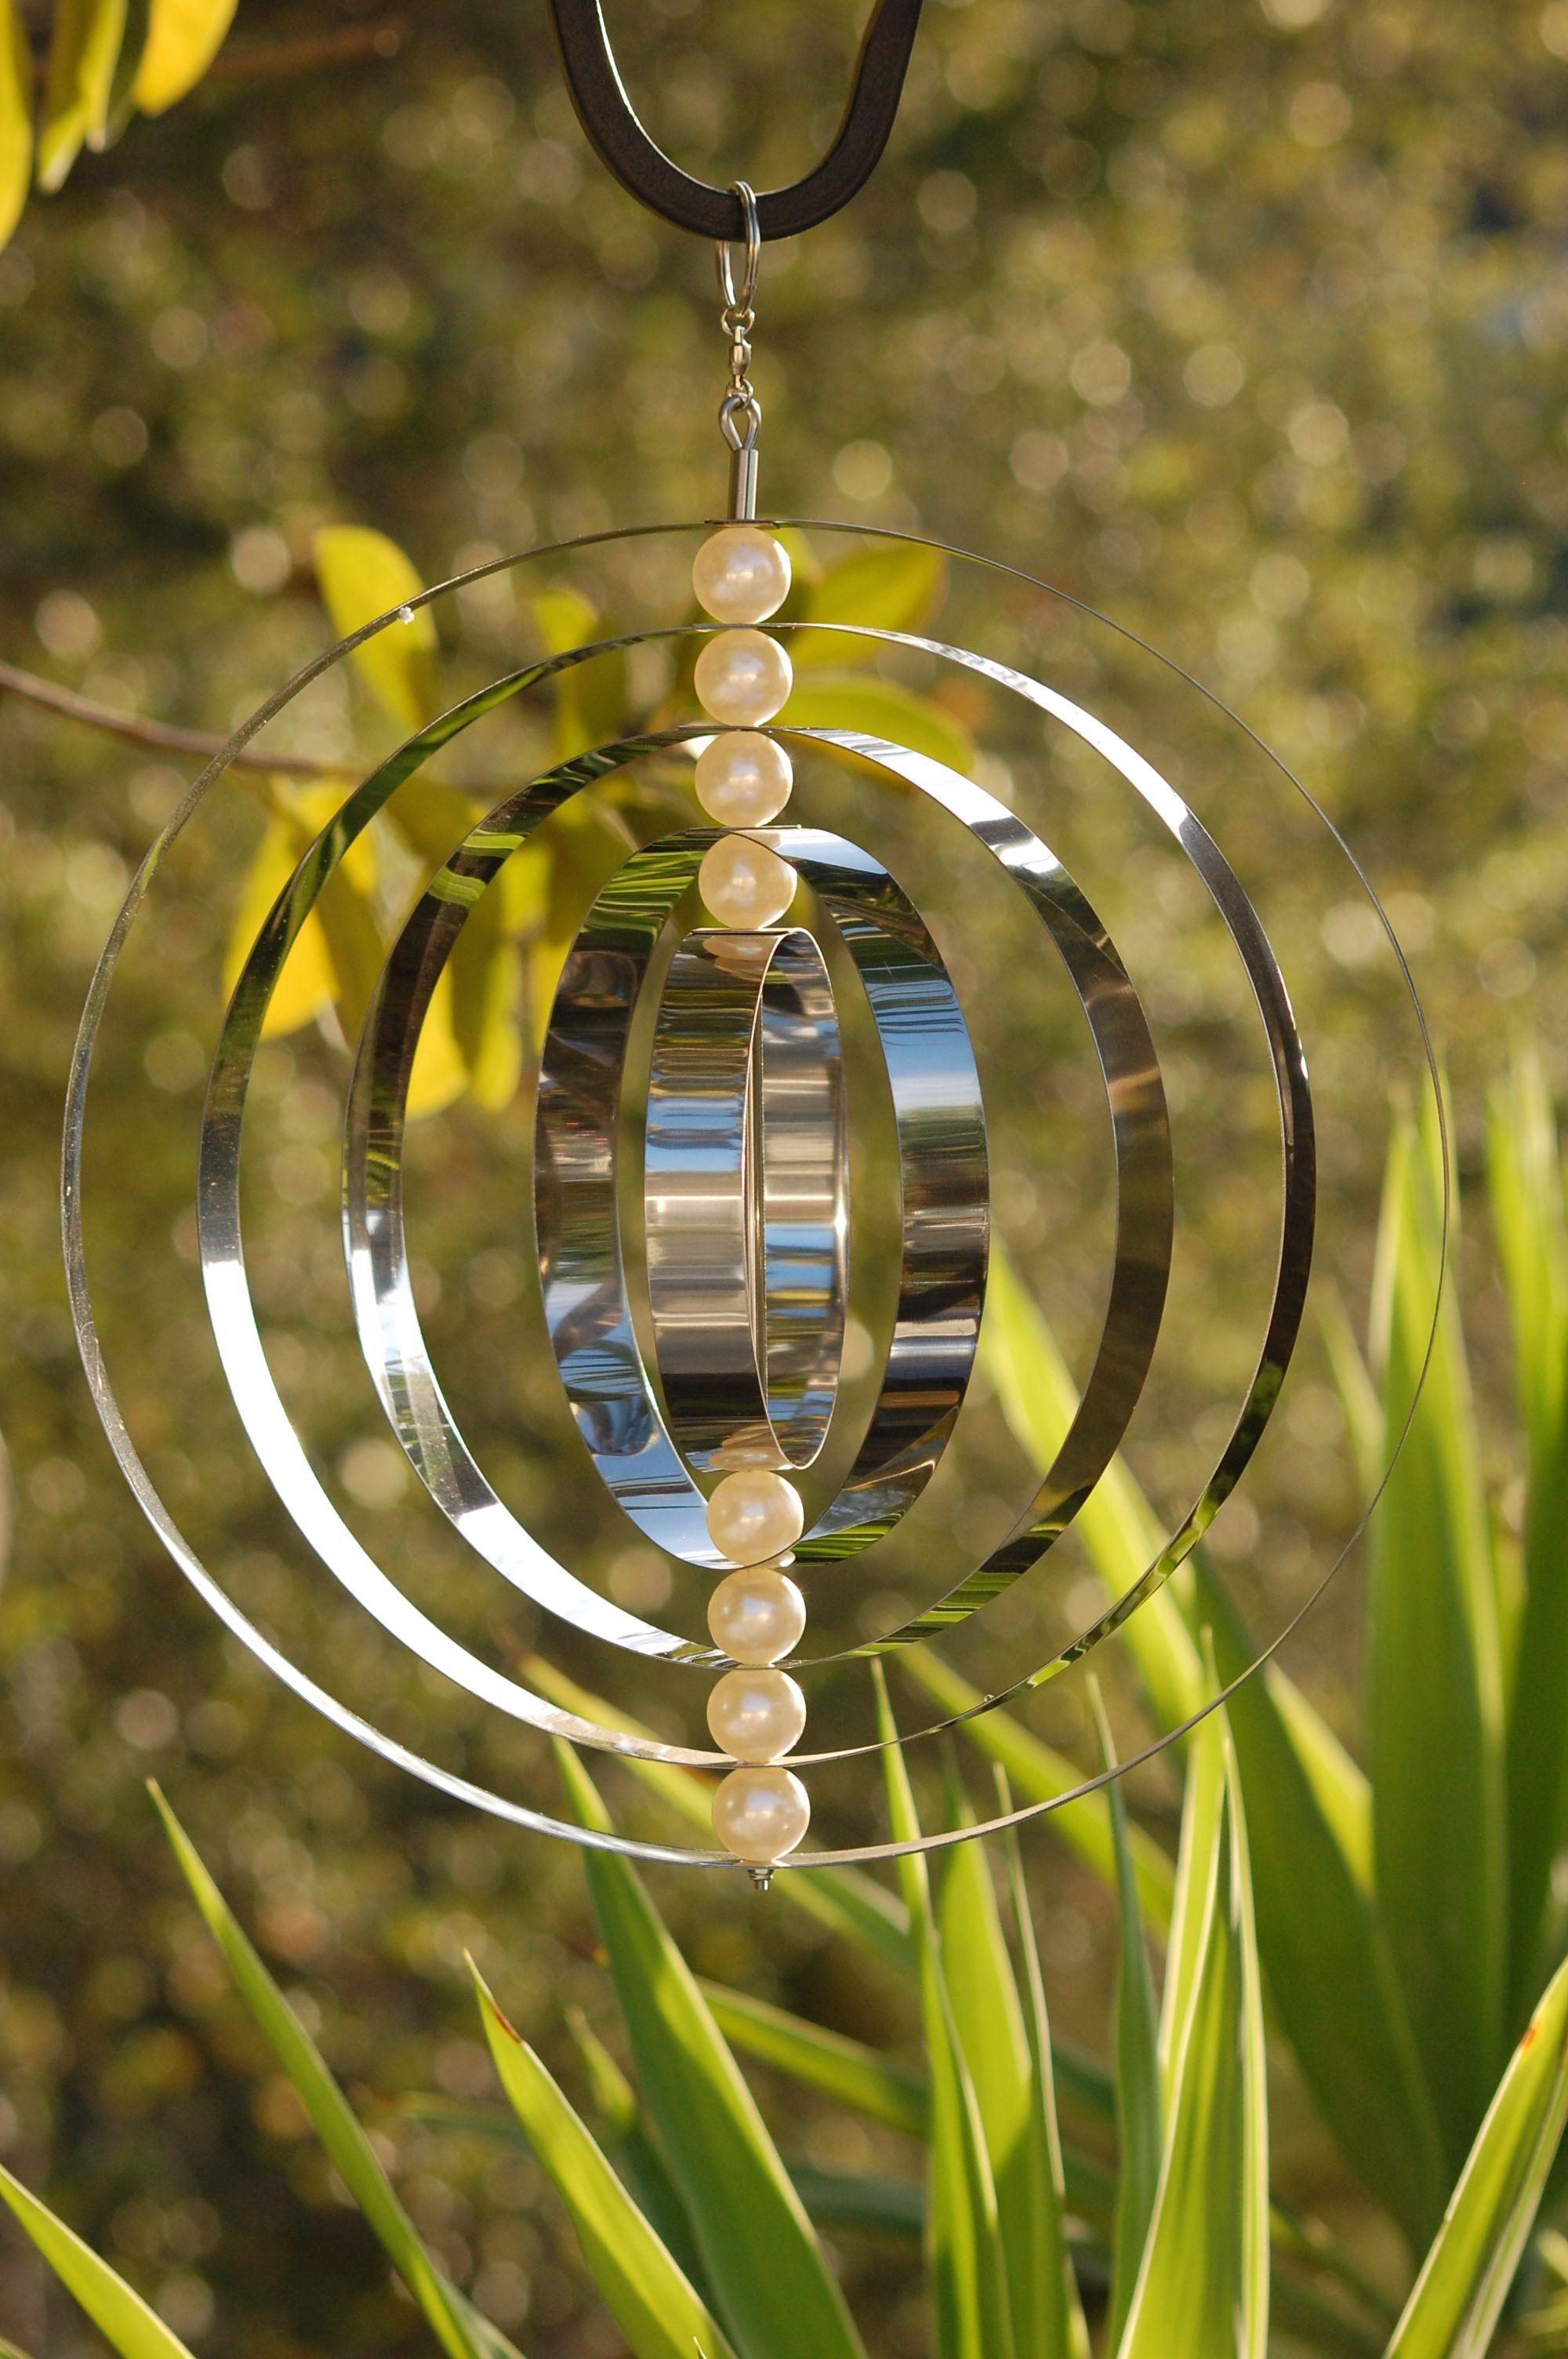 Celestial Spinner - beautifully reflective and meditative. $21.99 ...